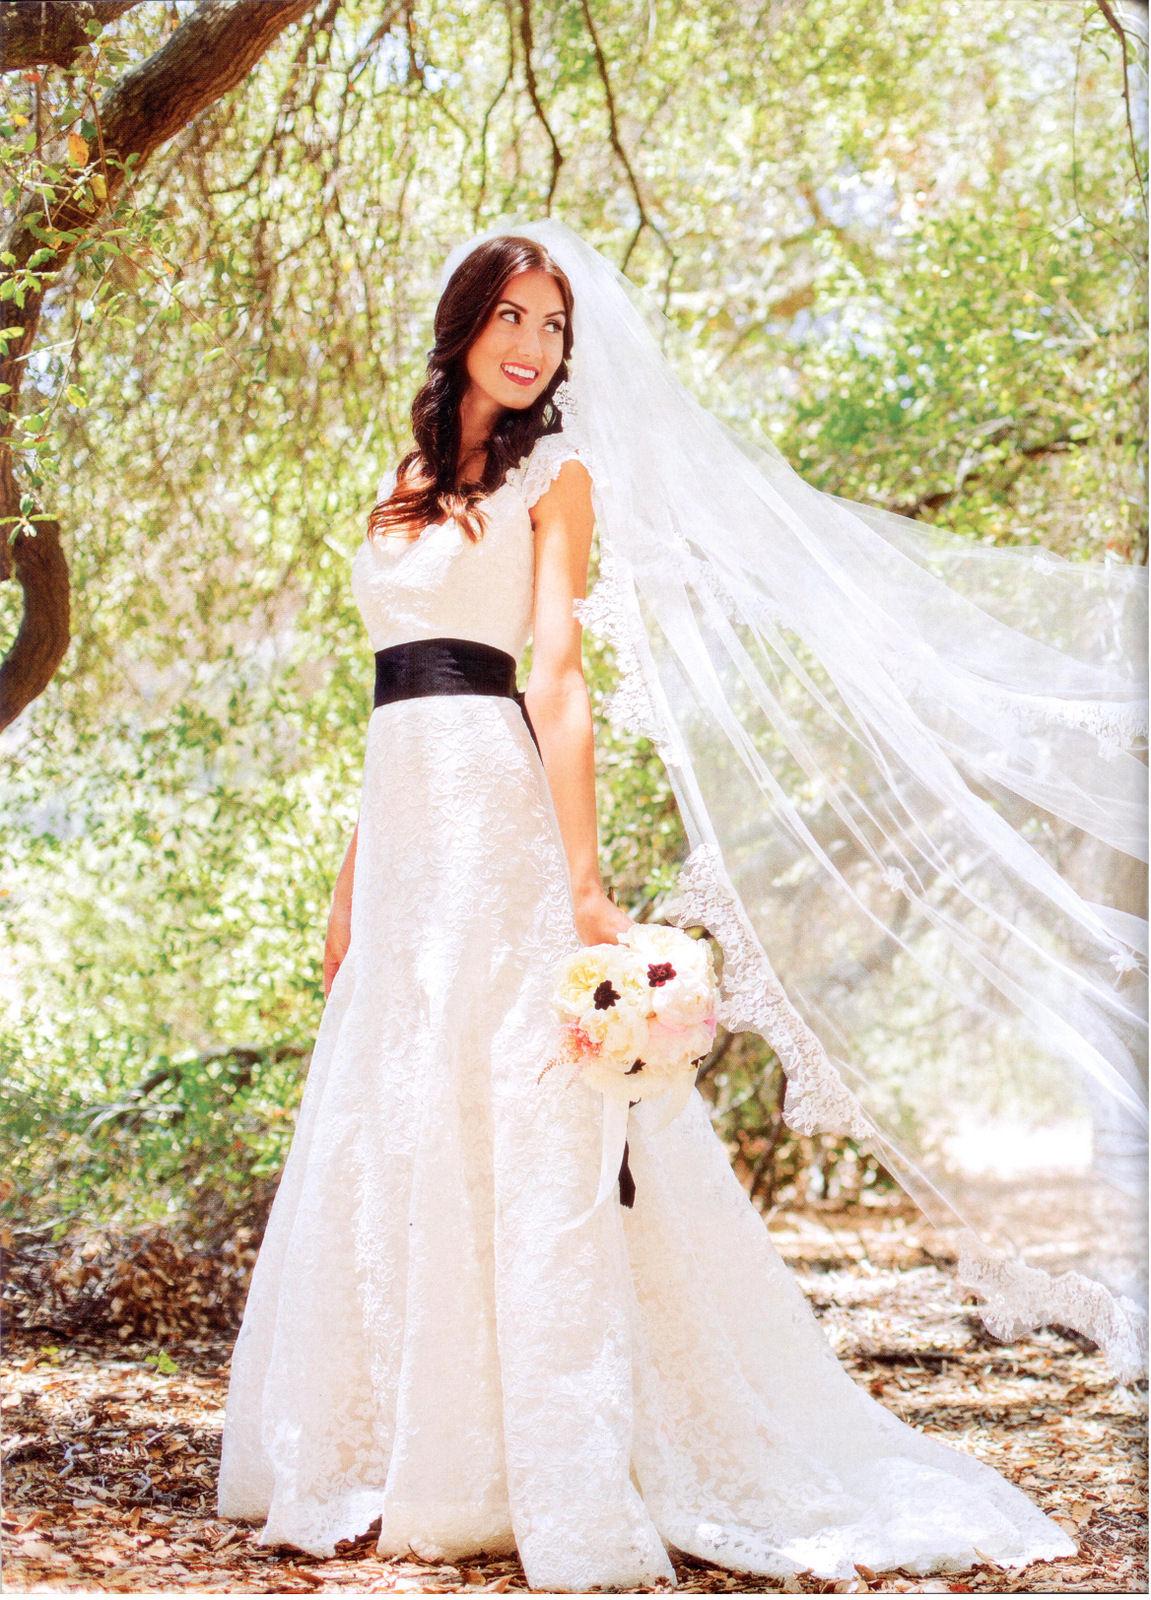 Exquisite Wedding Mag - Dec 2012 Jan 2013 English Rose Veil.jpg